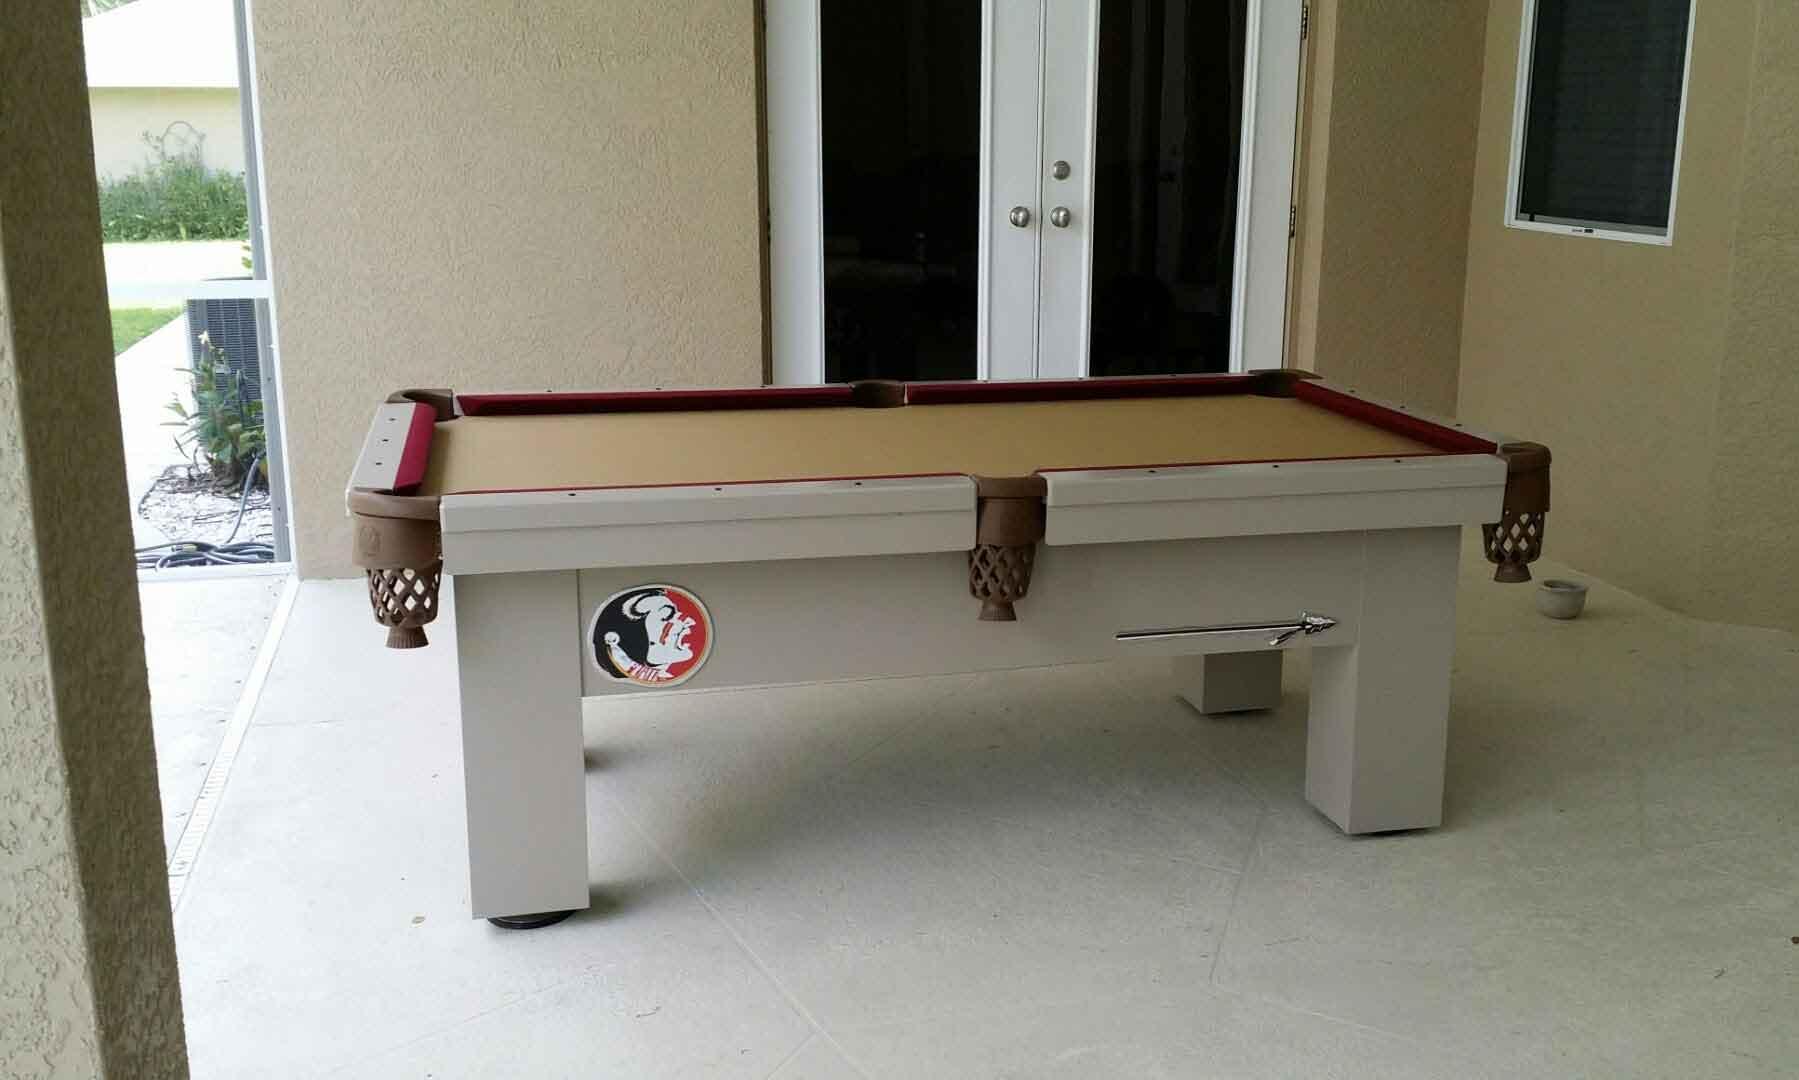 Florida State Seminoles embellished custom outdoor pool table